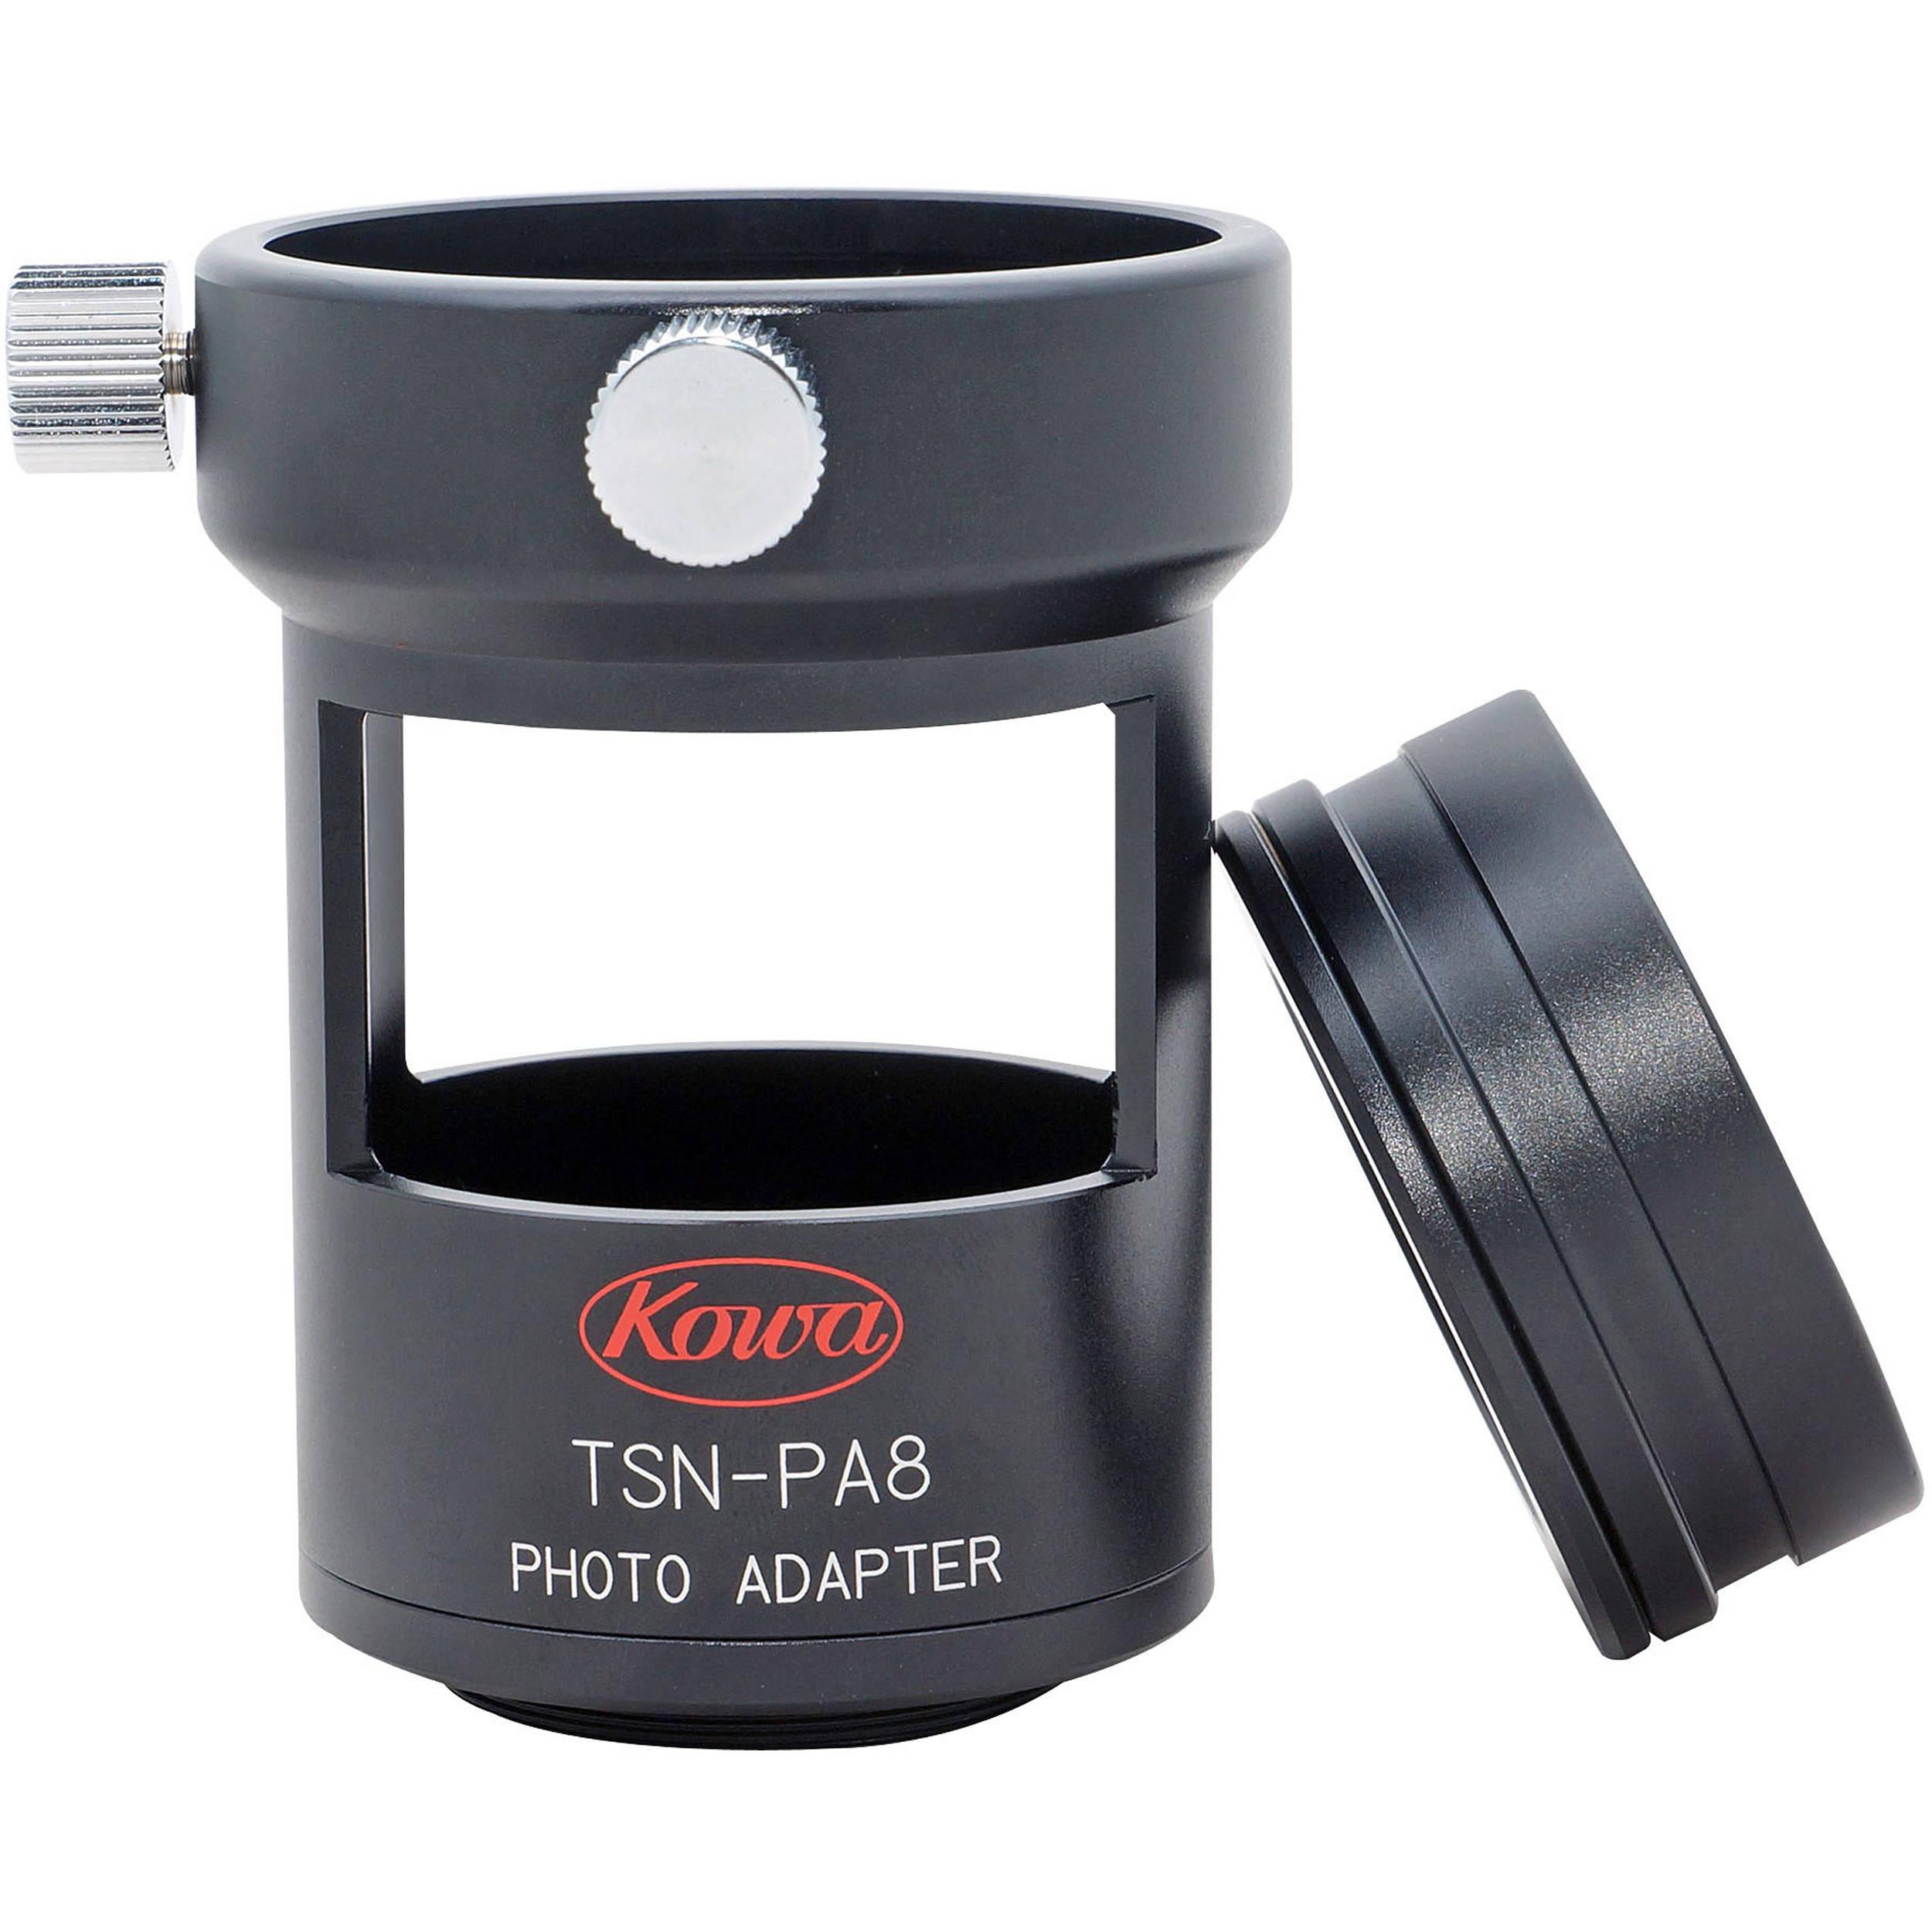 Fujifilm X A3 Silver Argent Xc16 50mm F35 56 Ois Ii Free Vgen Turbo Kit 16 Brown Kowa Tsn Pa8 Digiscoping Adapter 1210362 Source